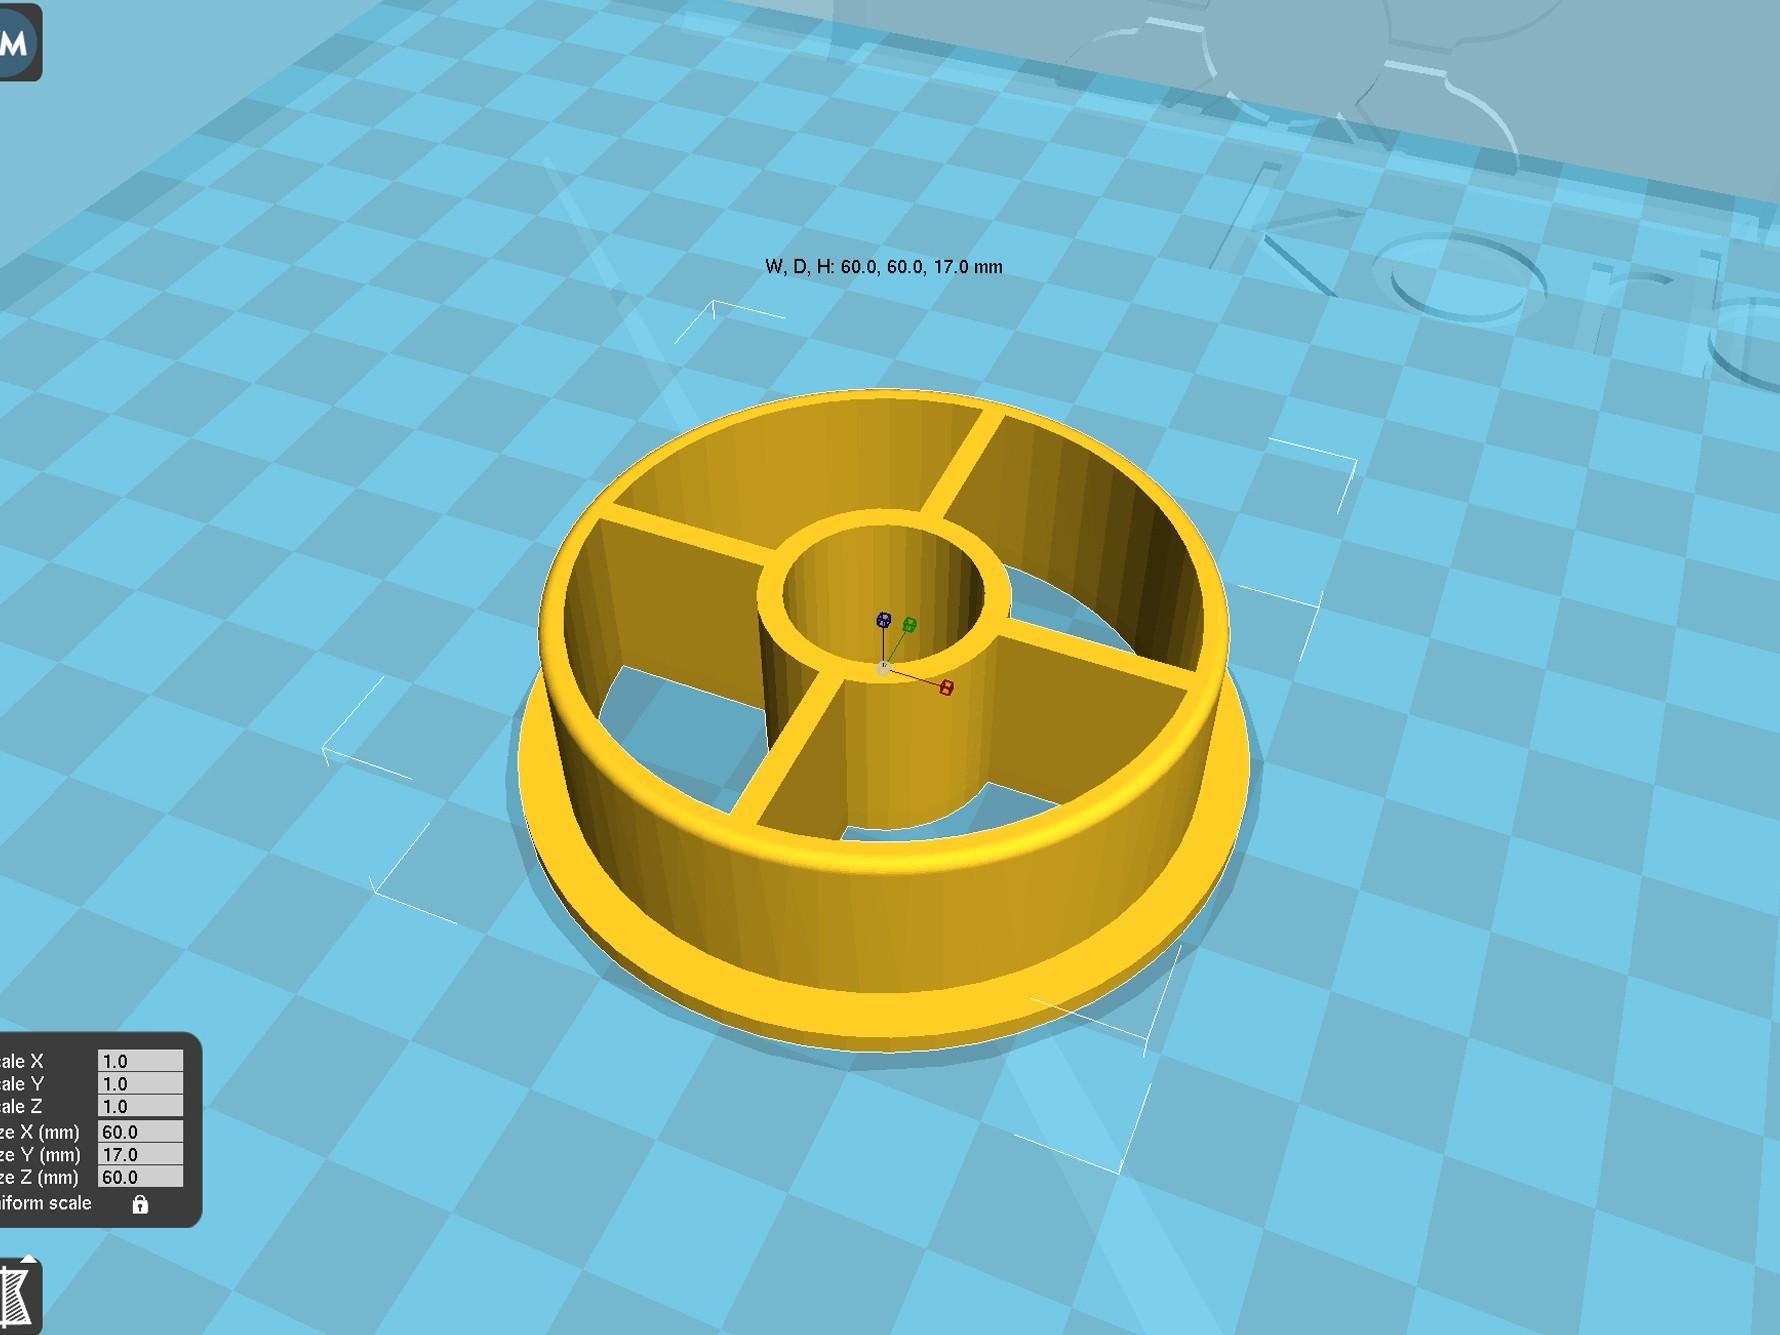 spool_adapter_53_in15.jpg Download free STL file 3d printer filament spool_adapter_53_in15 • 3D printing design, 3D_parts